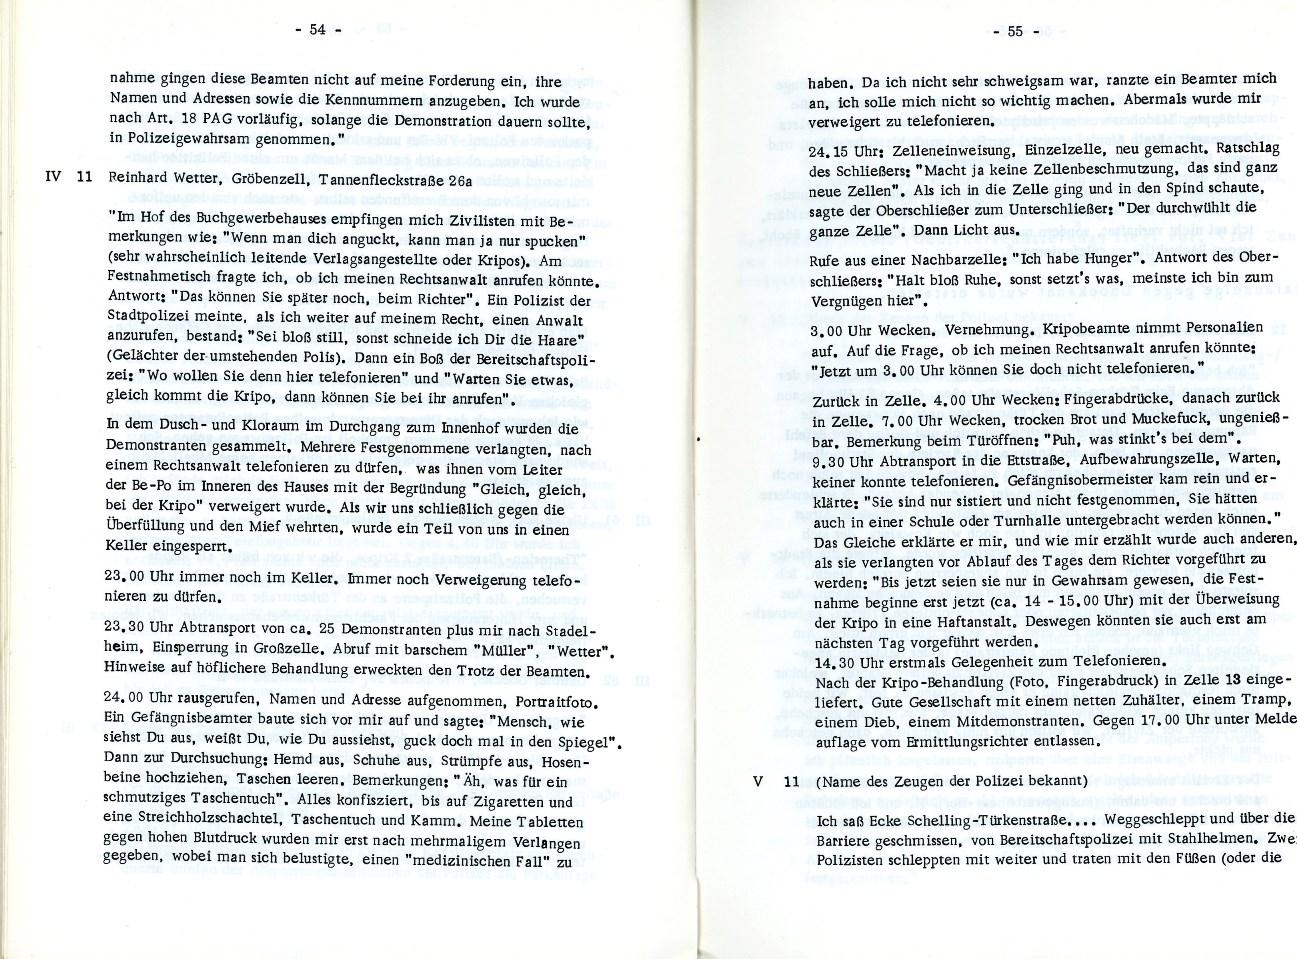 Muenchen_Doku_Osterdemonstrationen_1968_30